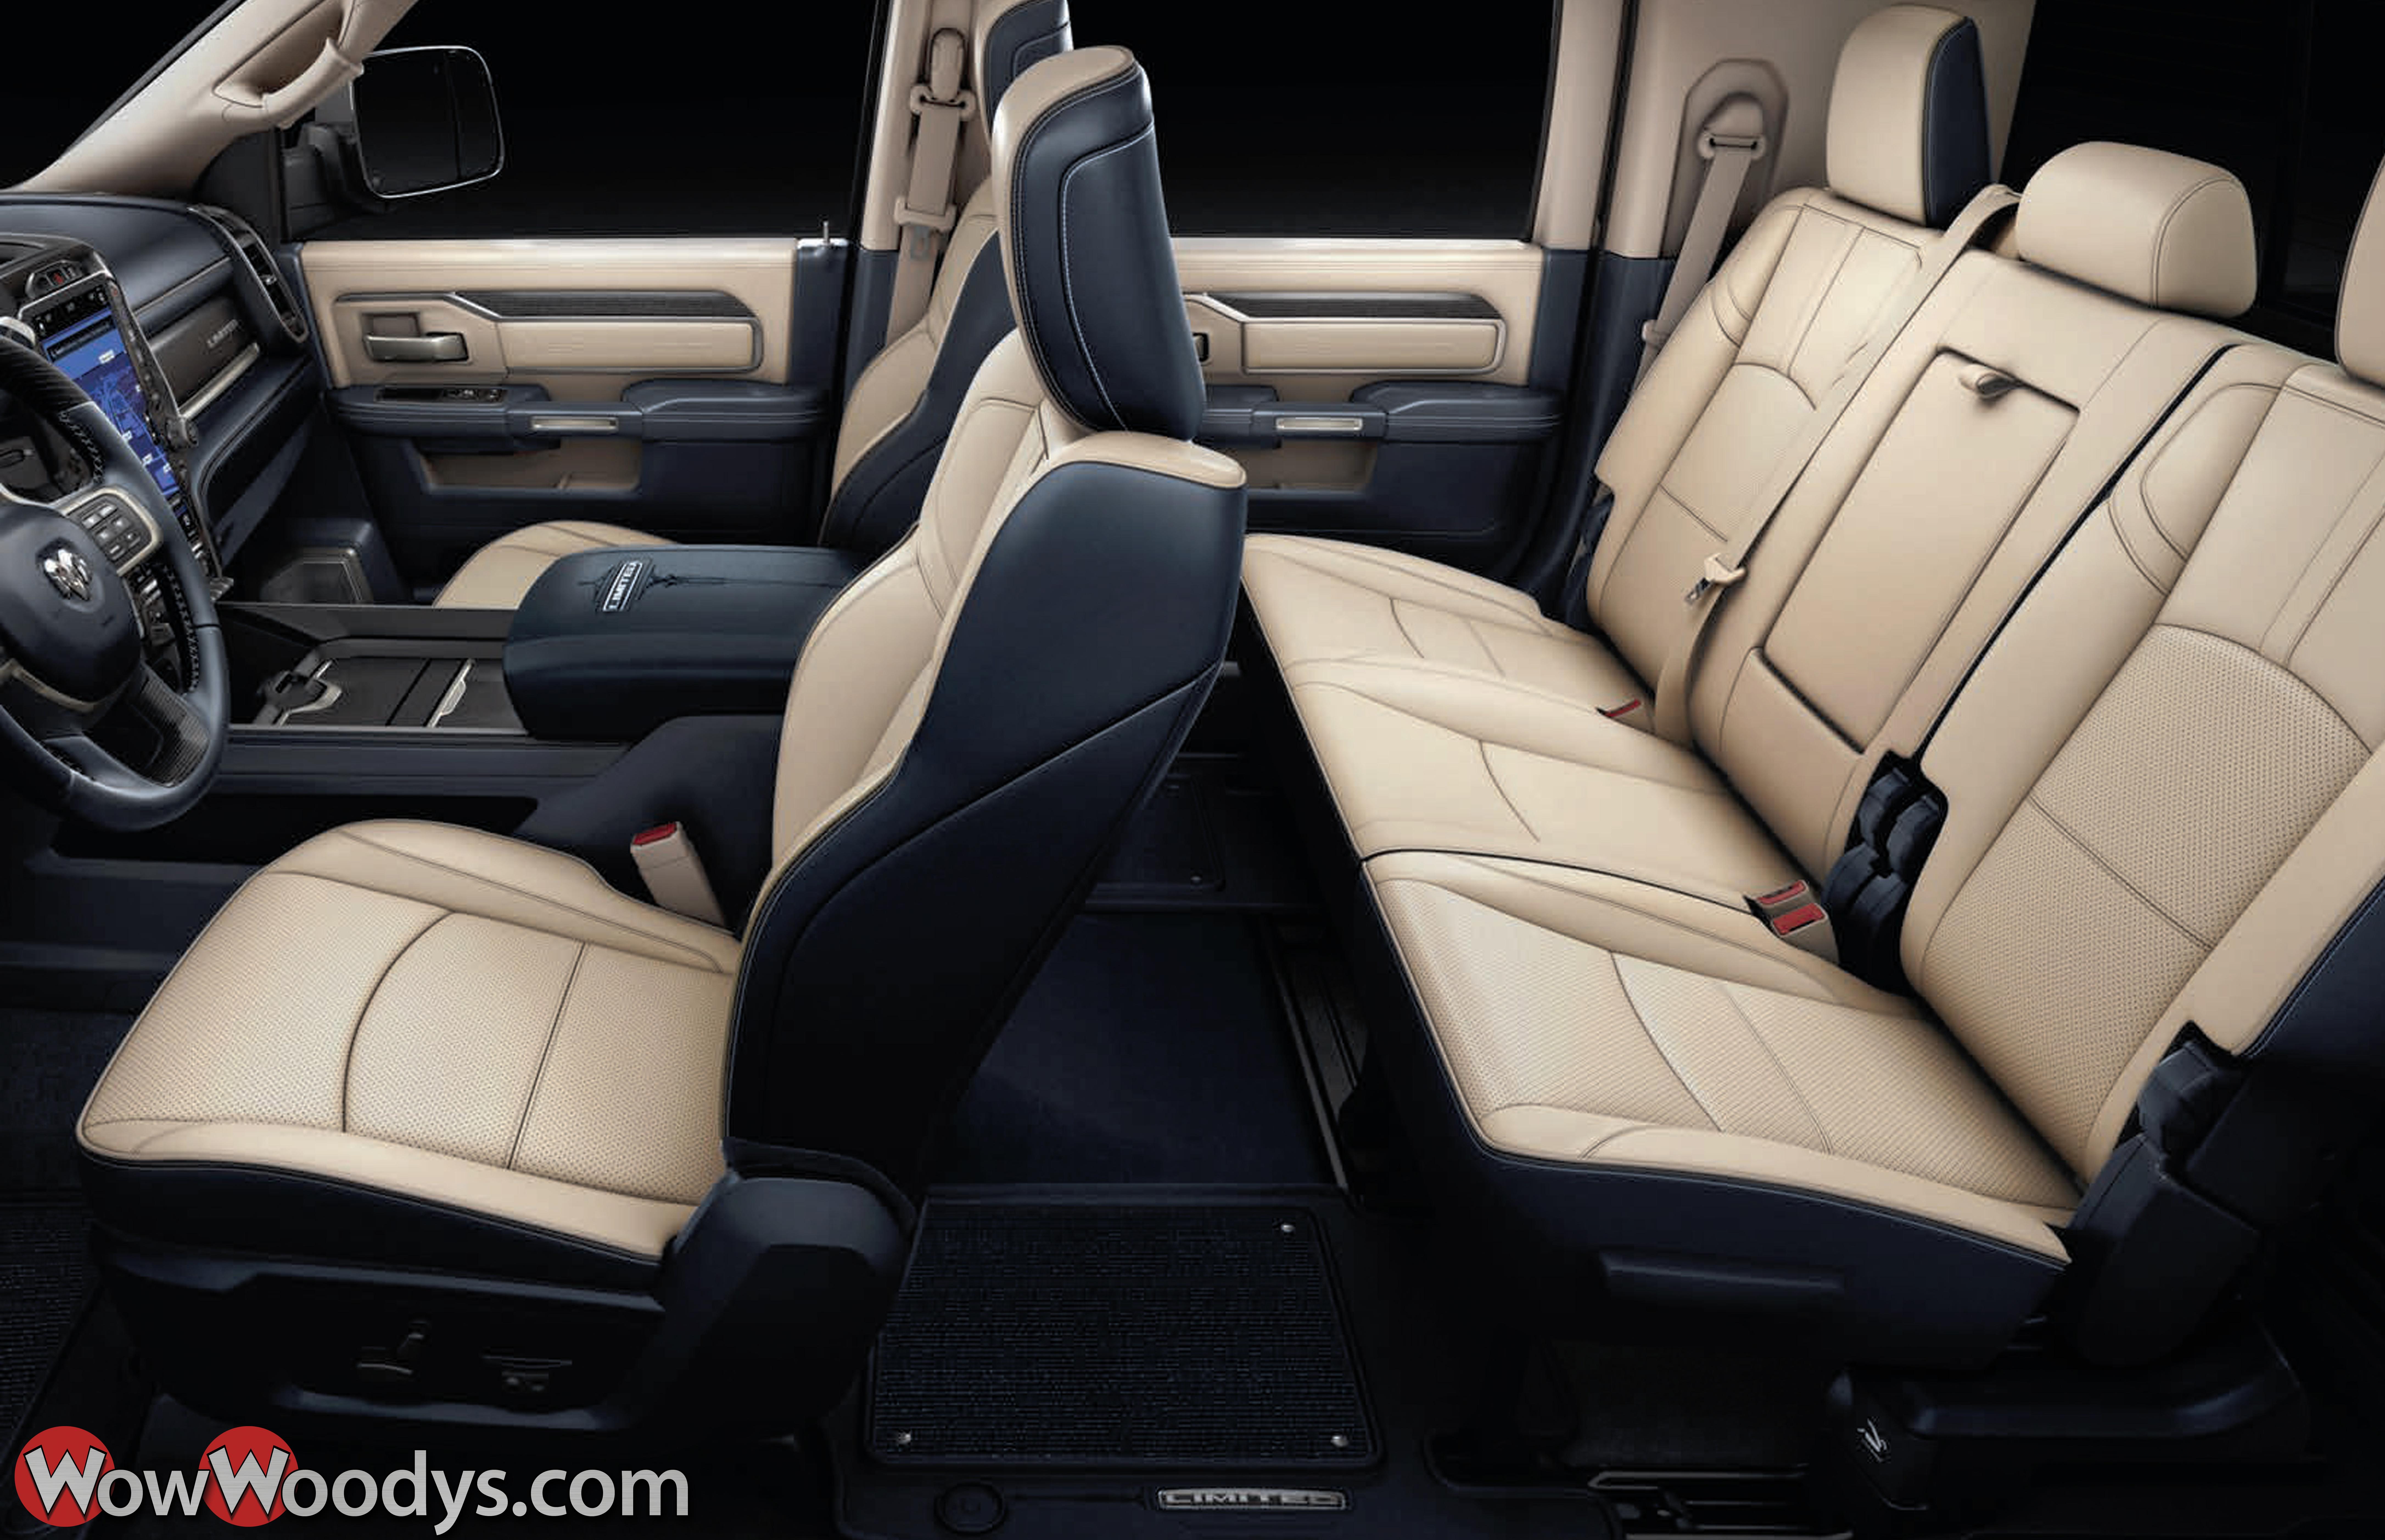 2019 Ram 3500 Luxurious Interiors